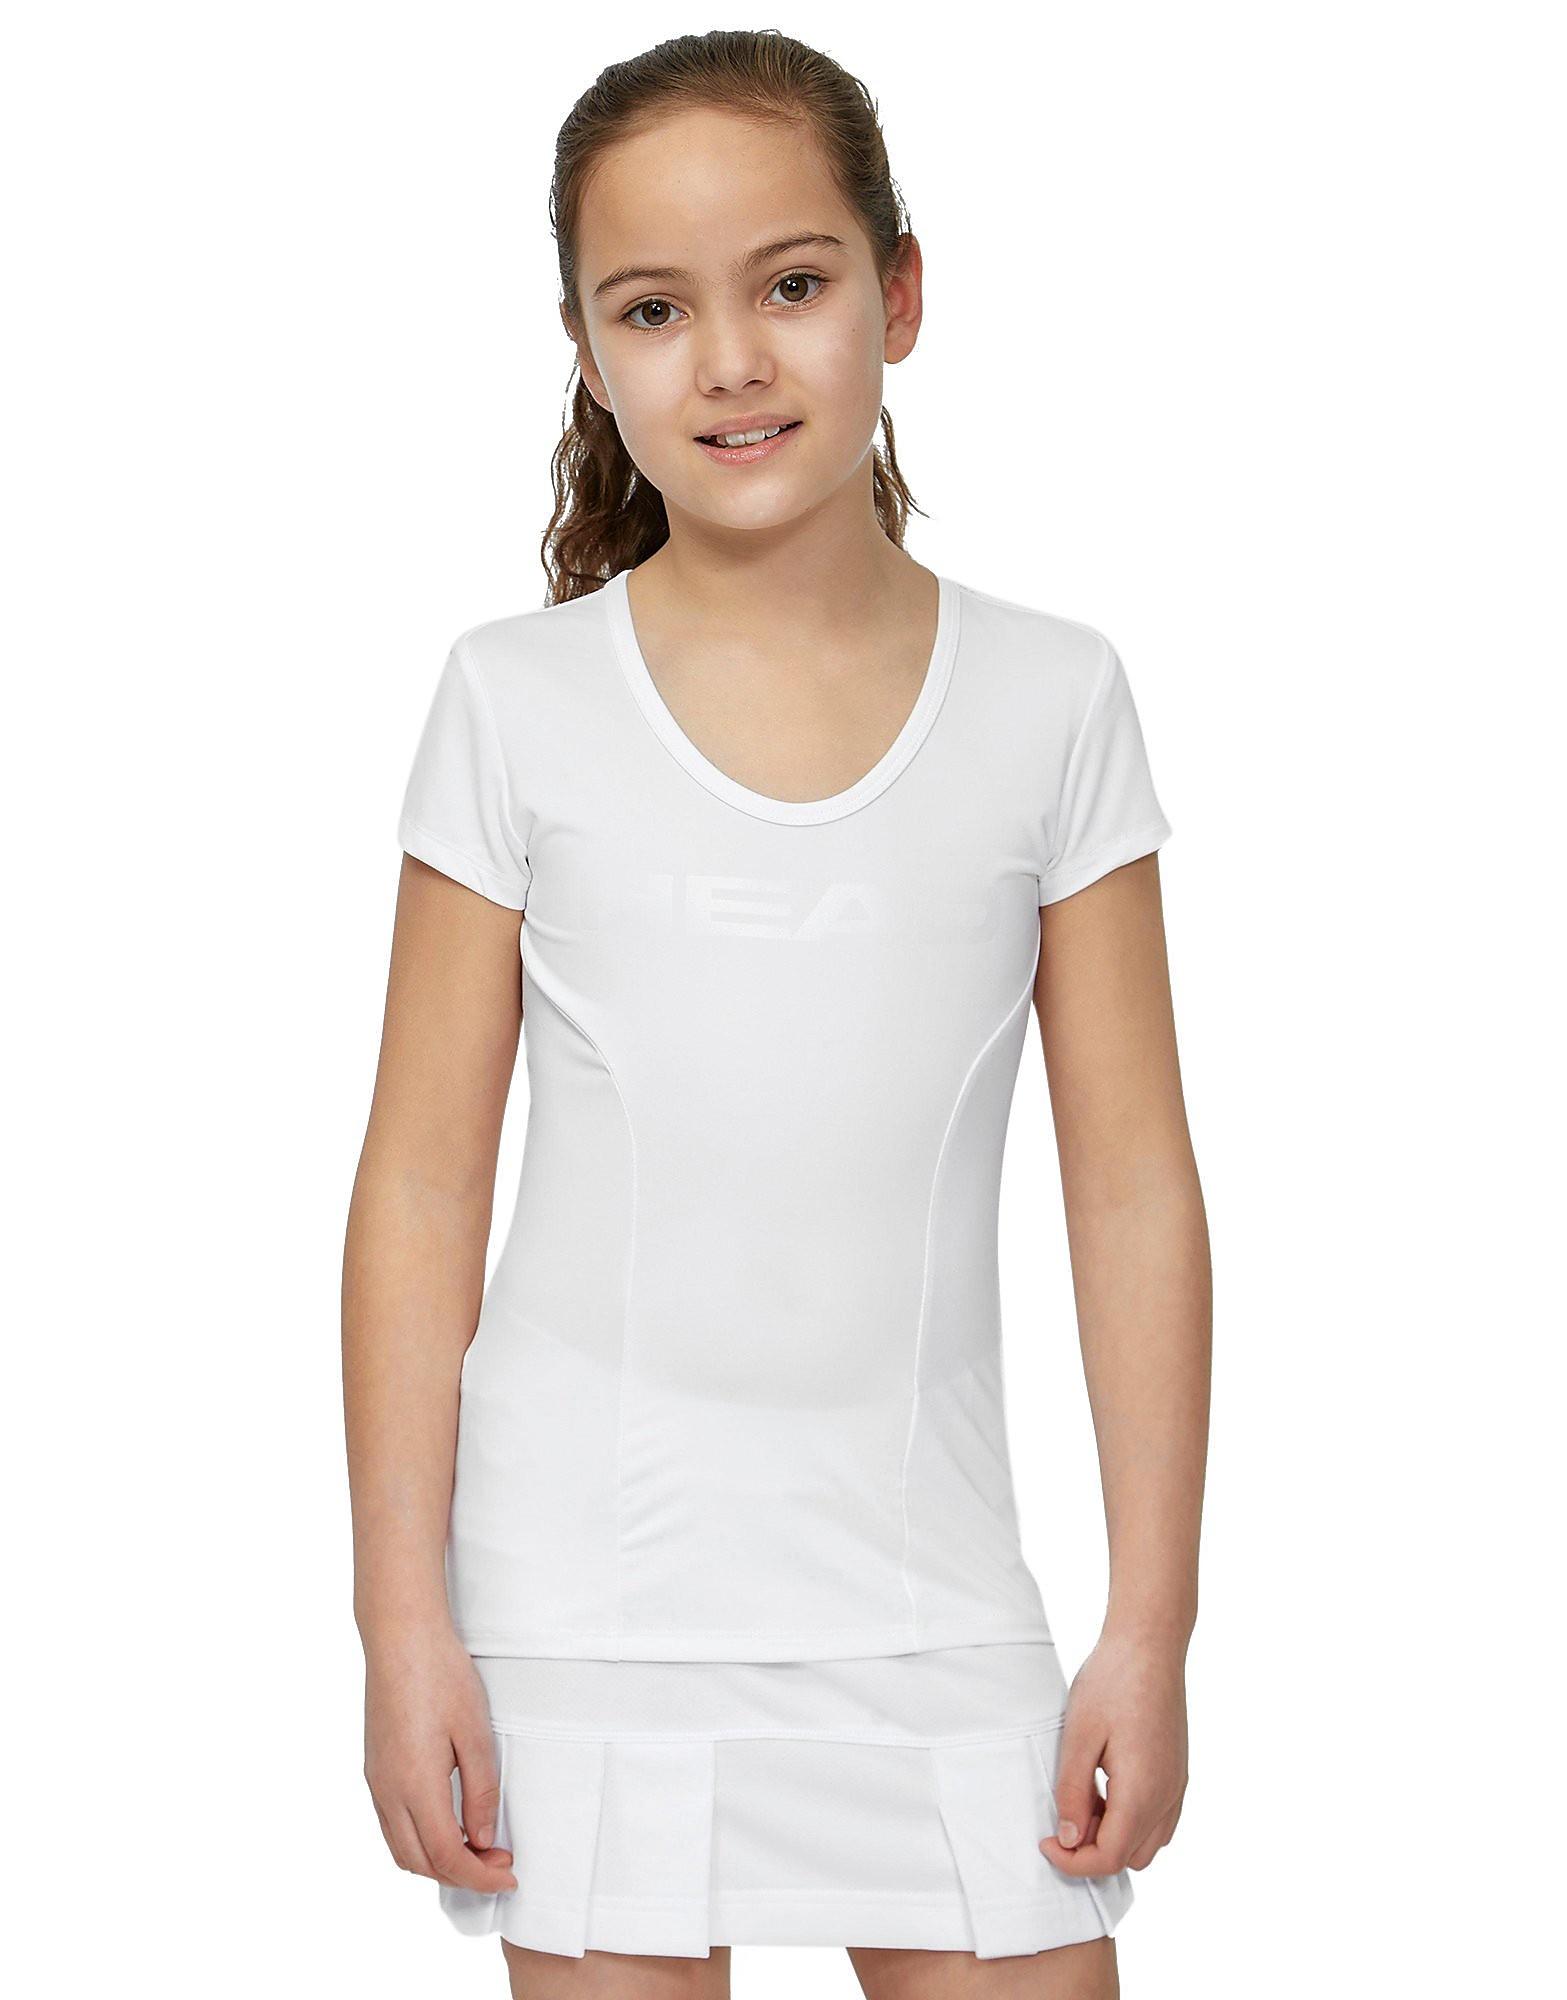 Head Vision Corpo Shirt Girl's